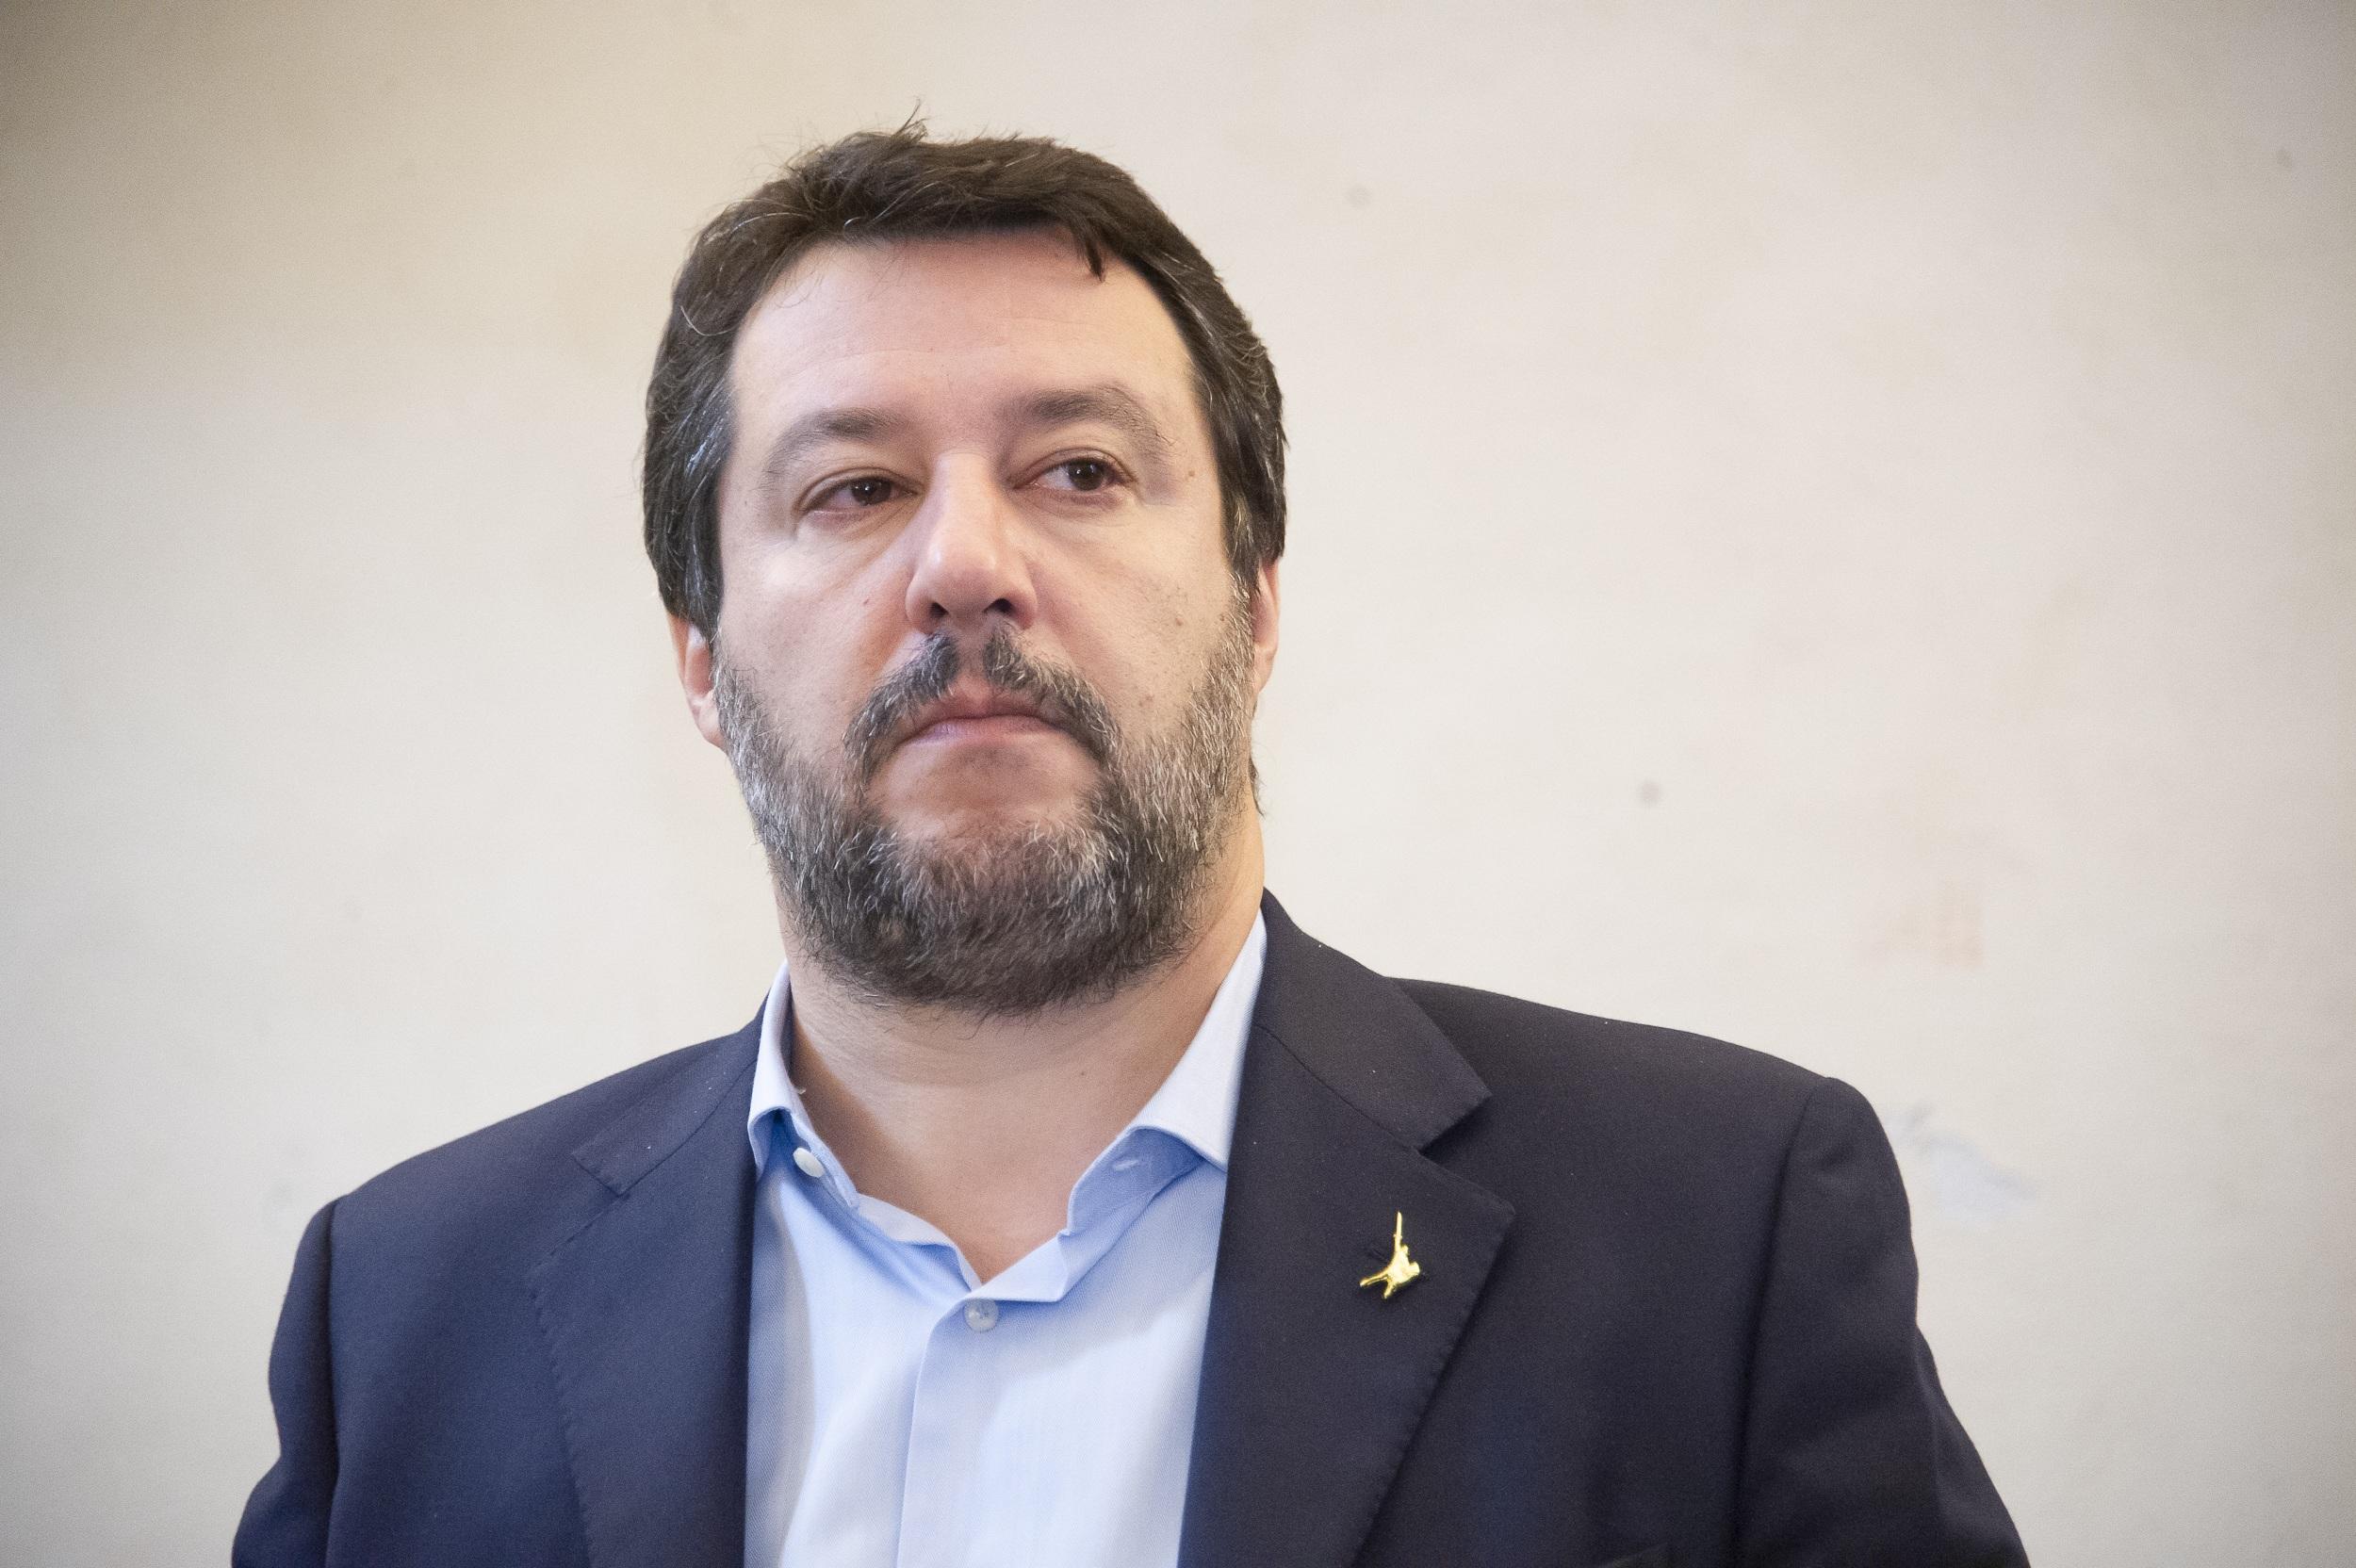 https://www.zerottounonews.it/wp-content/uploads/2020/05/salvini.jpg